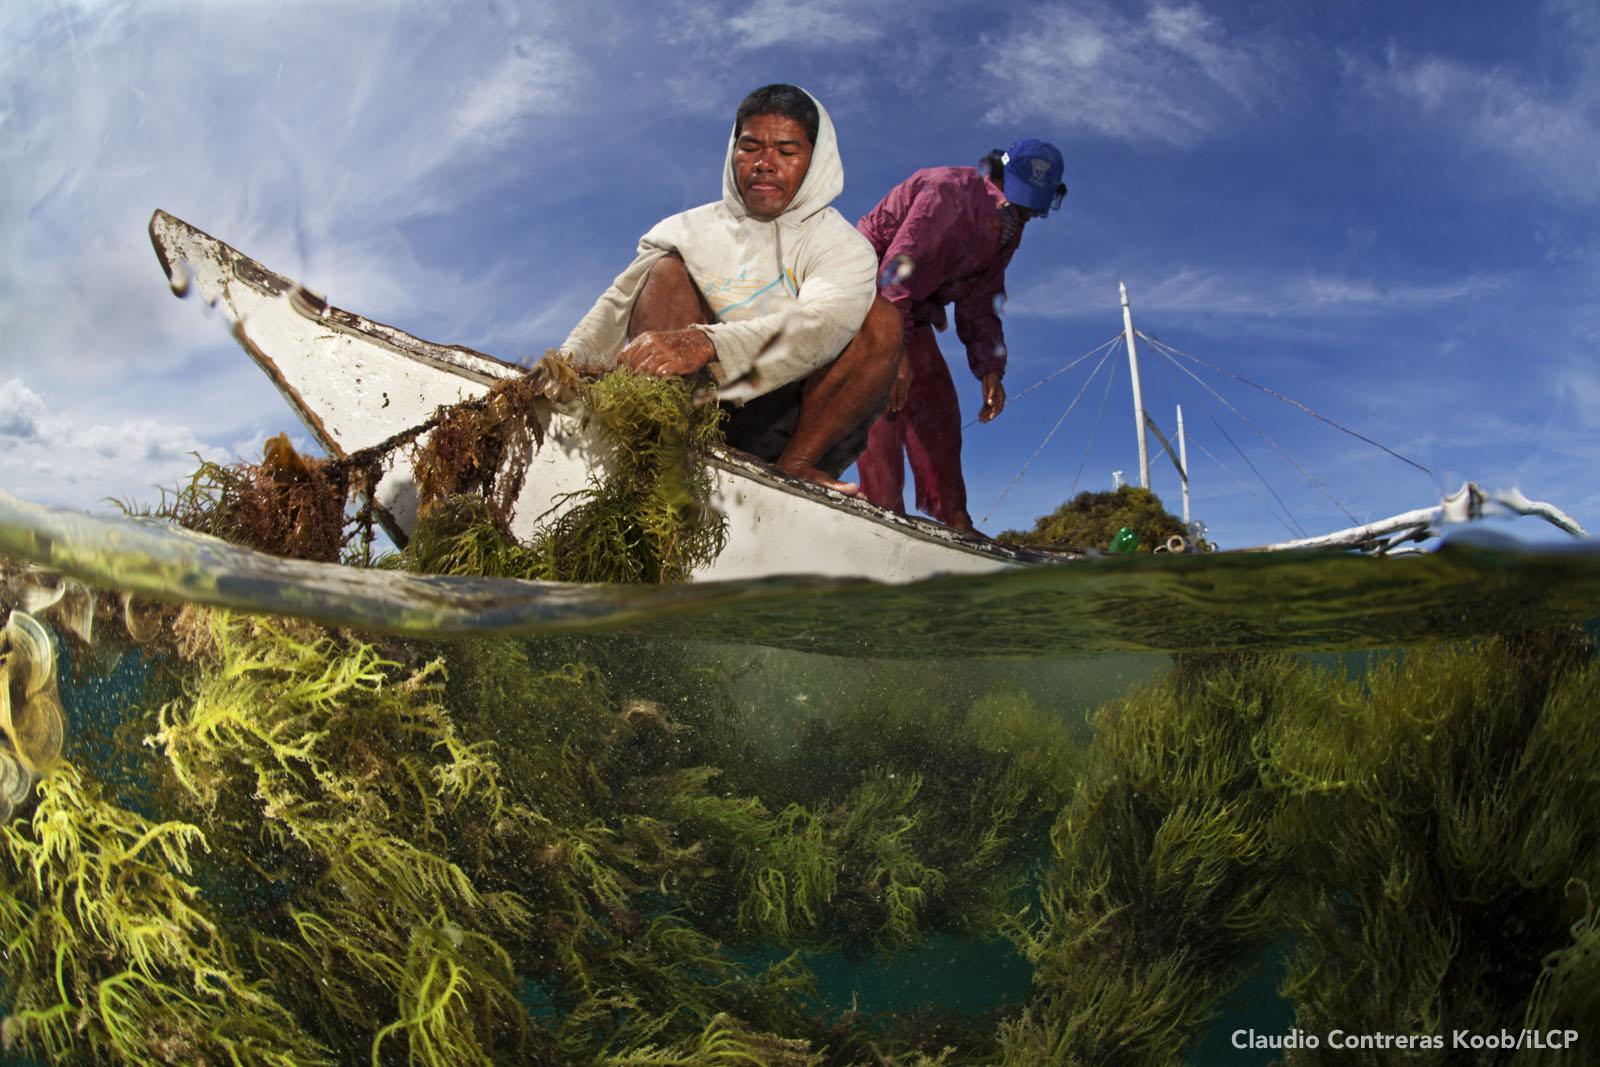 Seaweed farmers harvest their crop. Seaweed farming has become a valuable alternative livelihood on Danajon Bank. Claudio Contreras Koob/iLCP